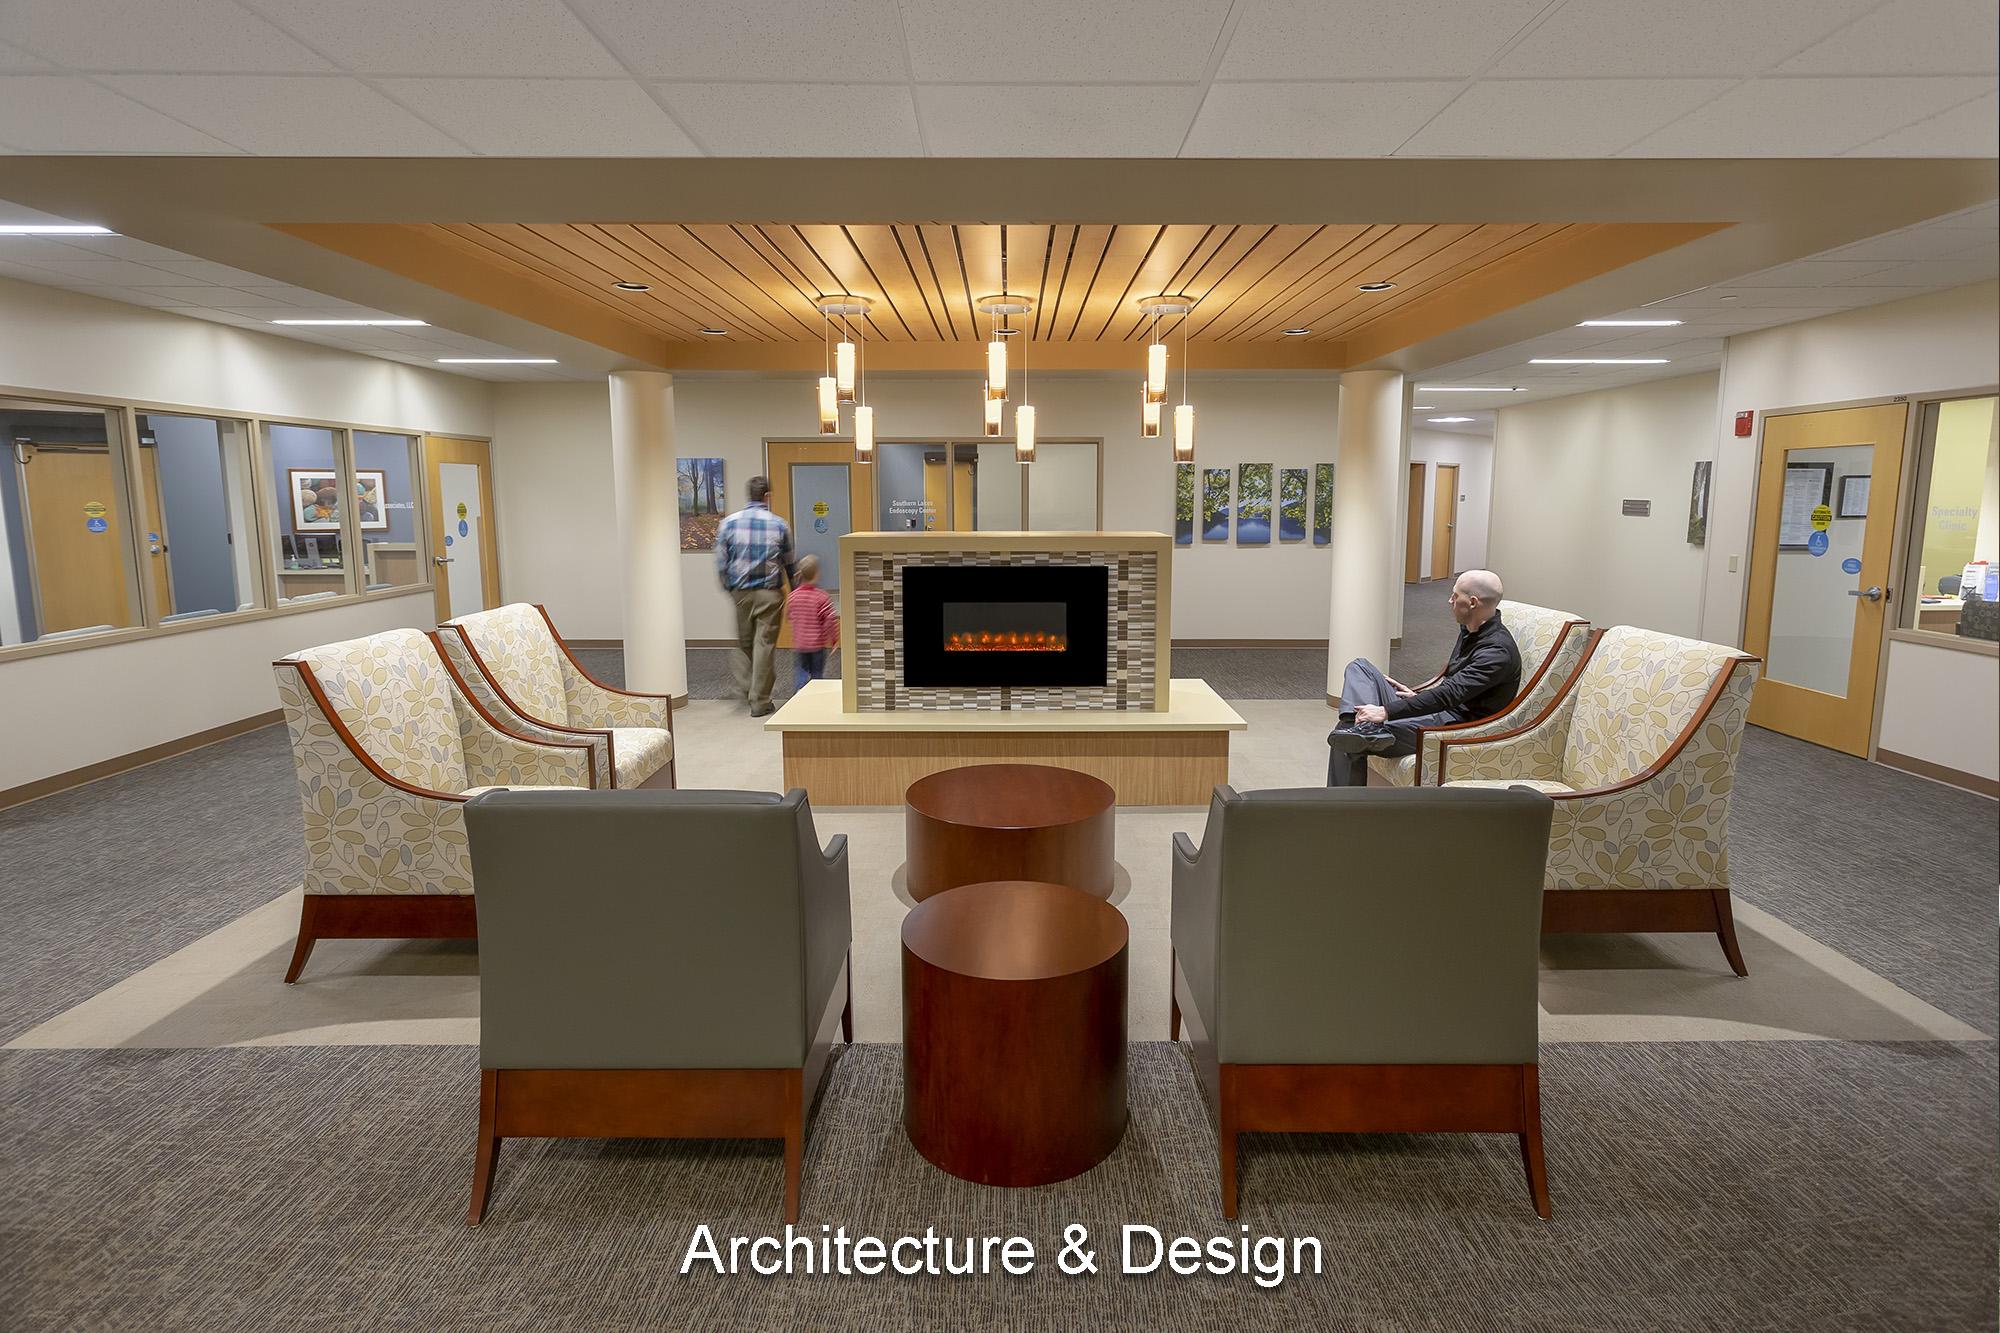 Arch design.jpg